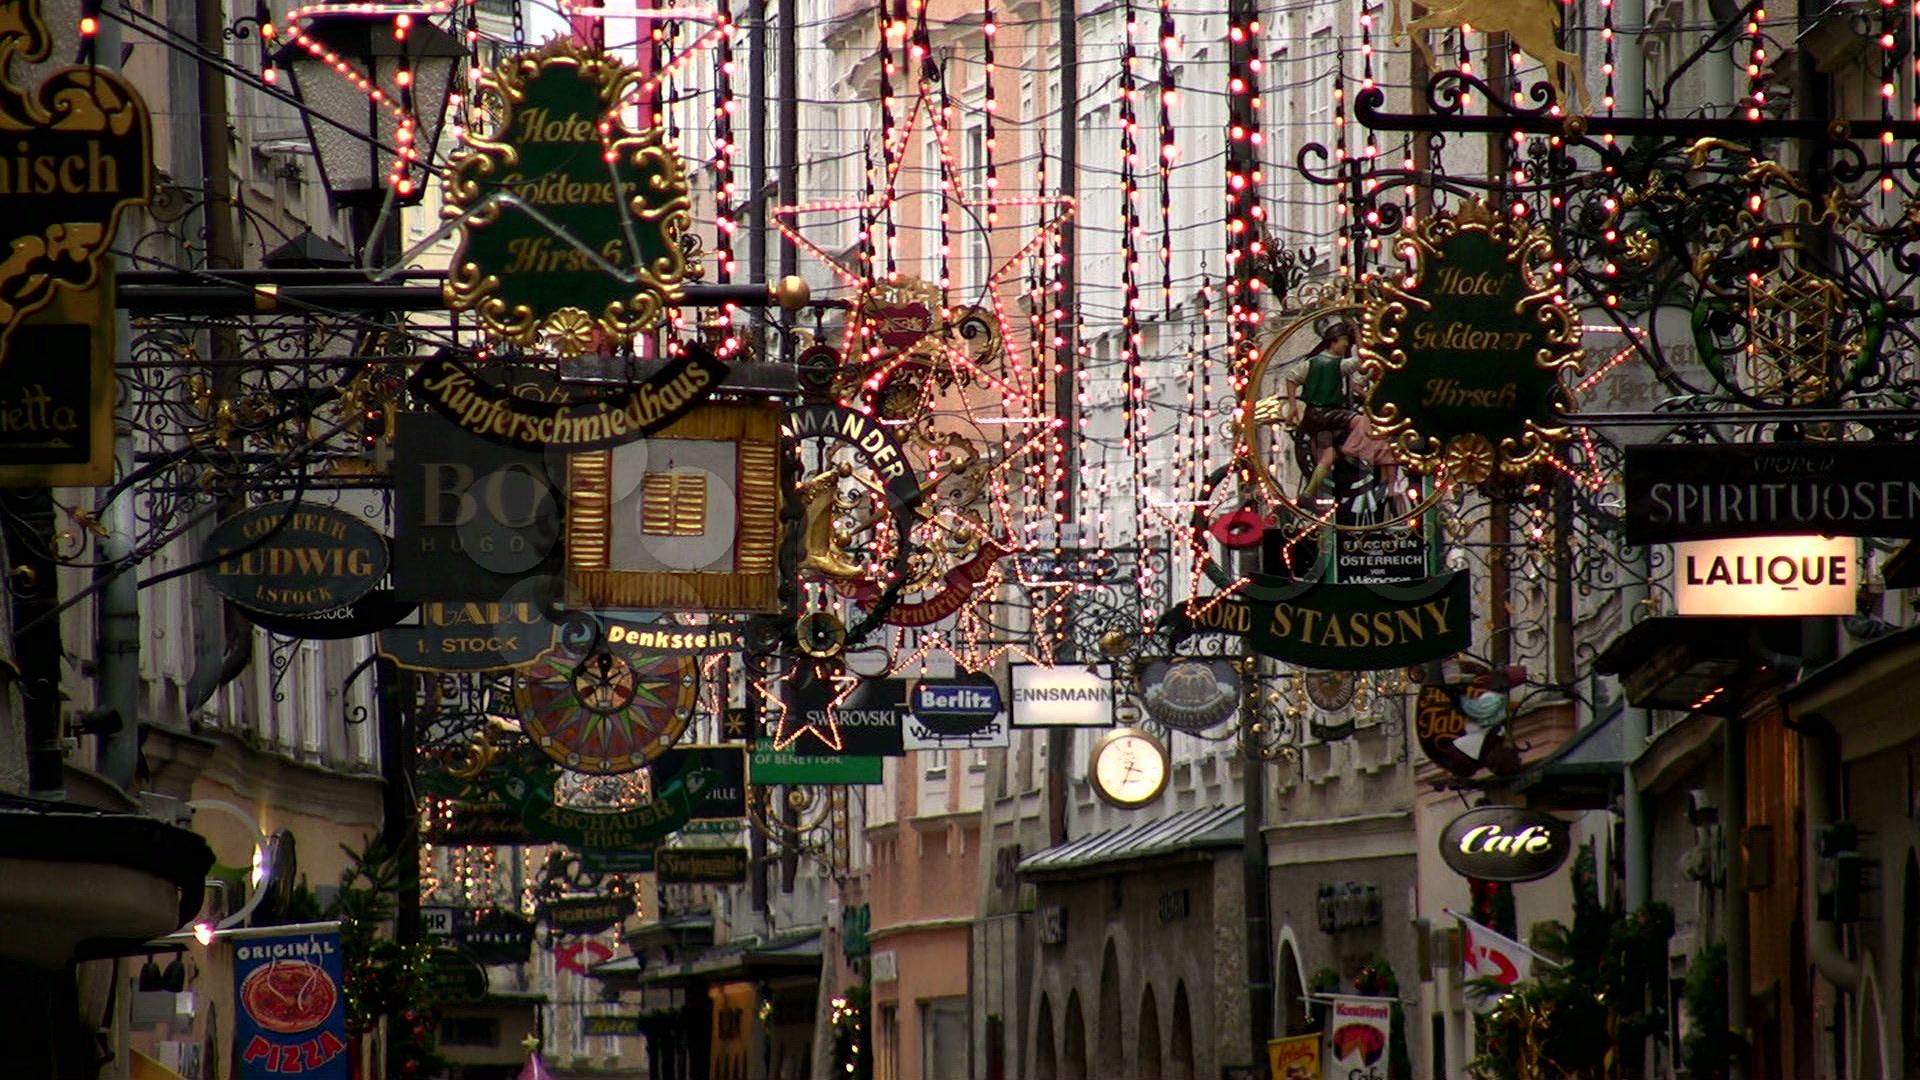 Cosa vedere a Salisburgo, top 10